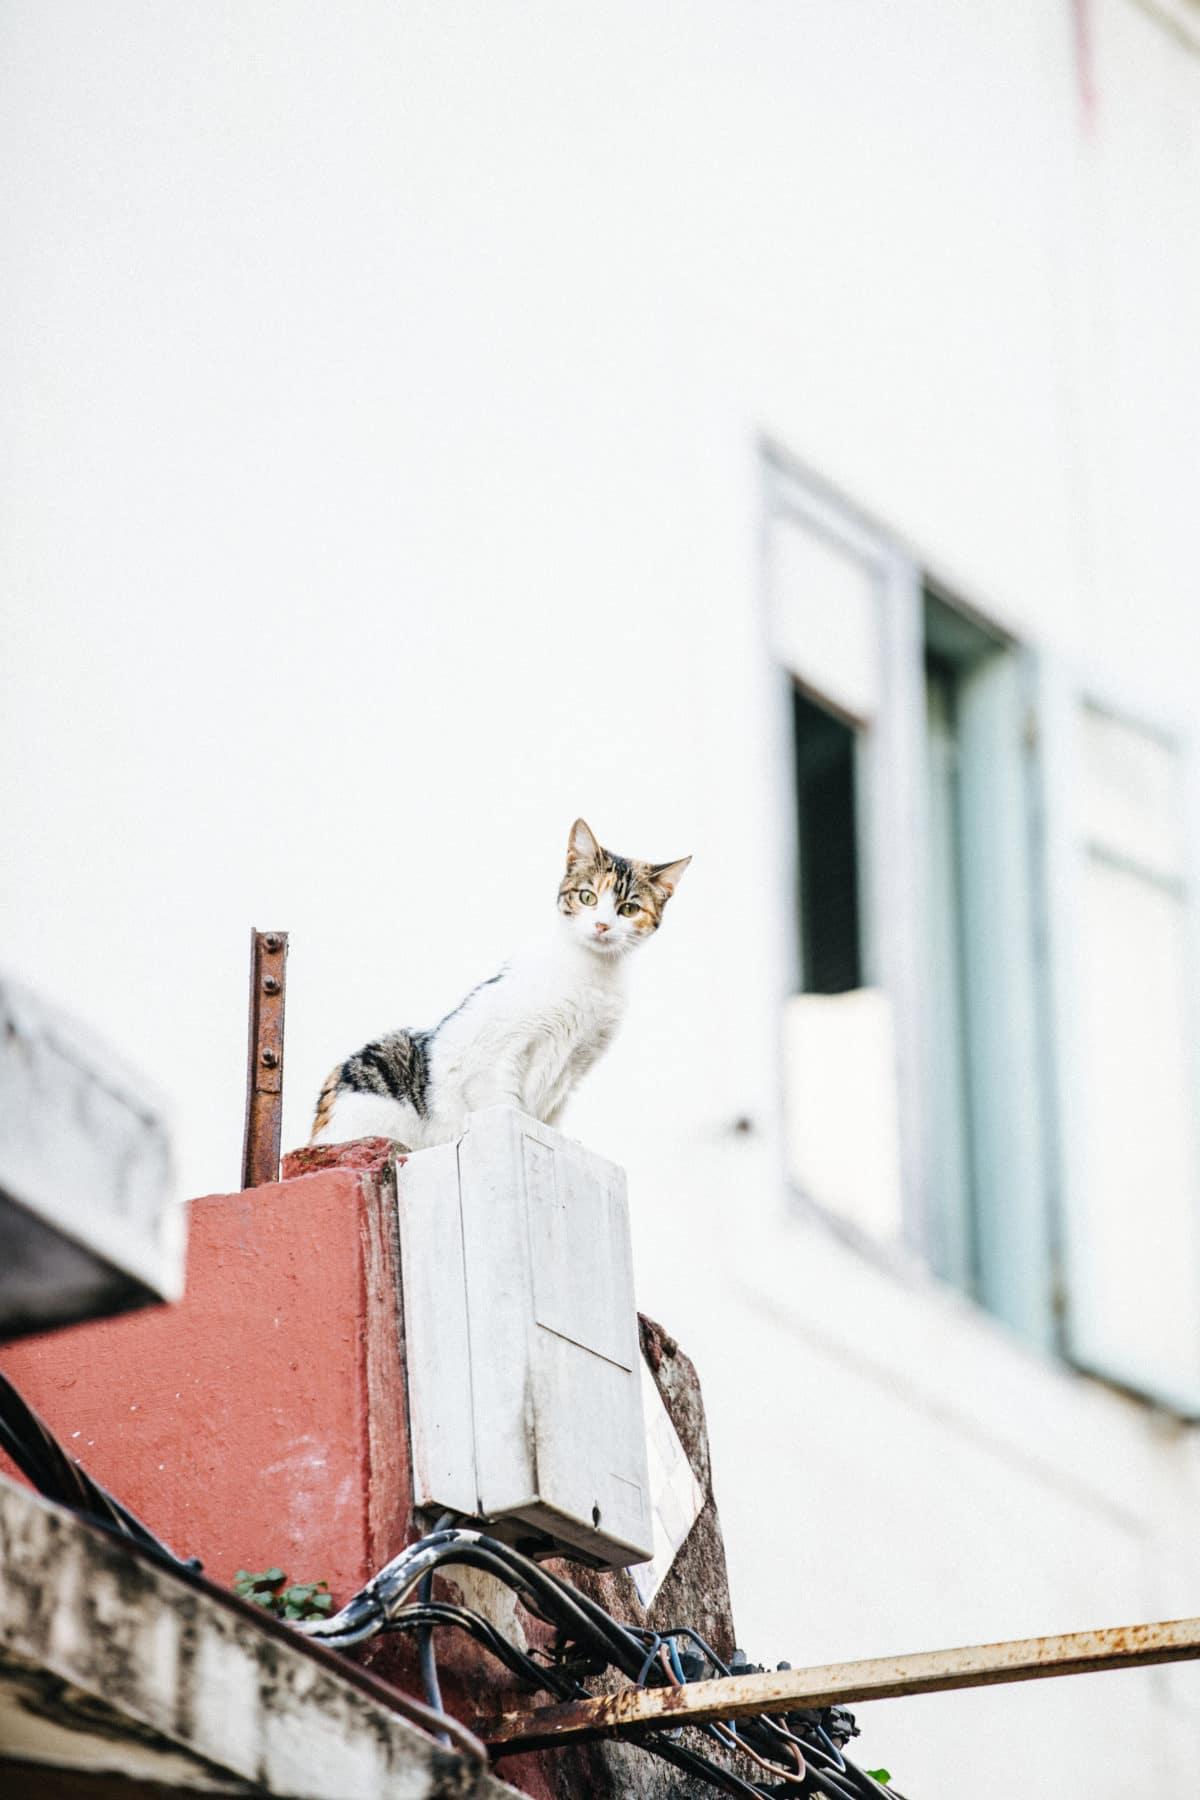 10_Katte_1563